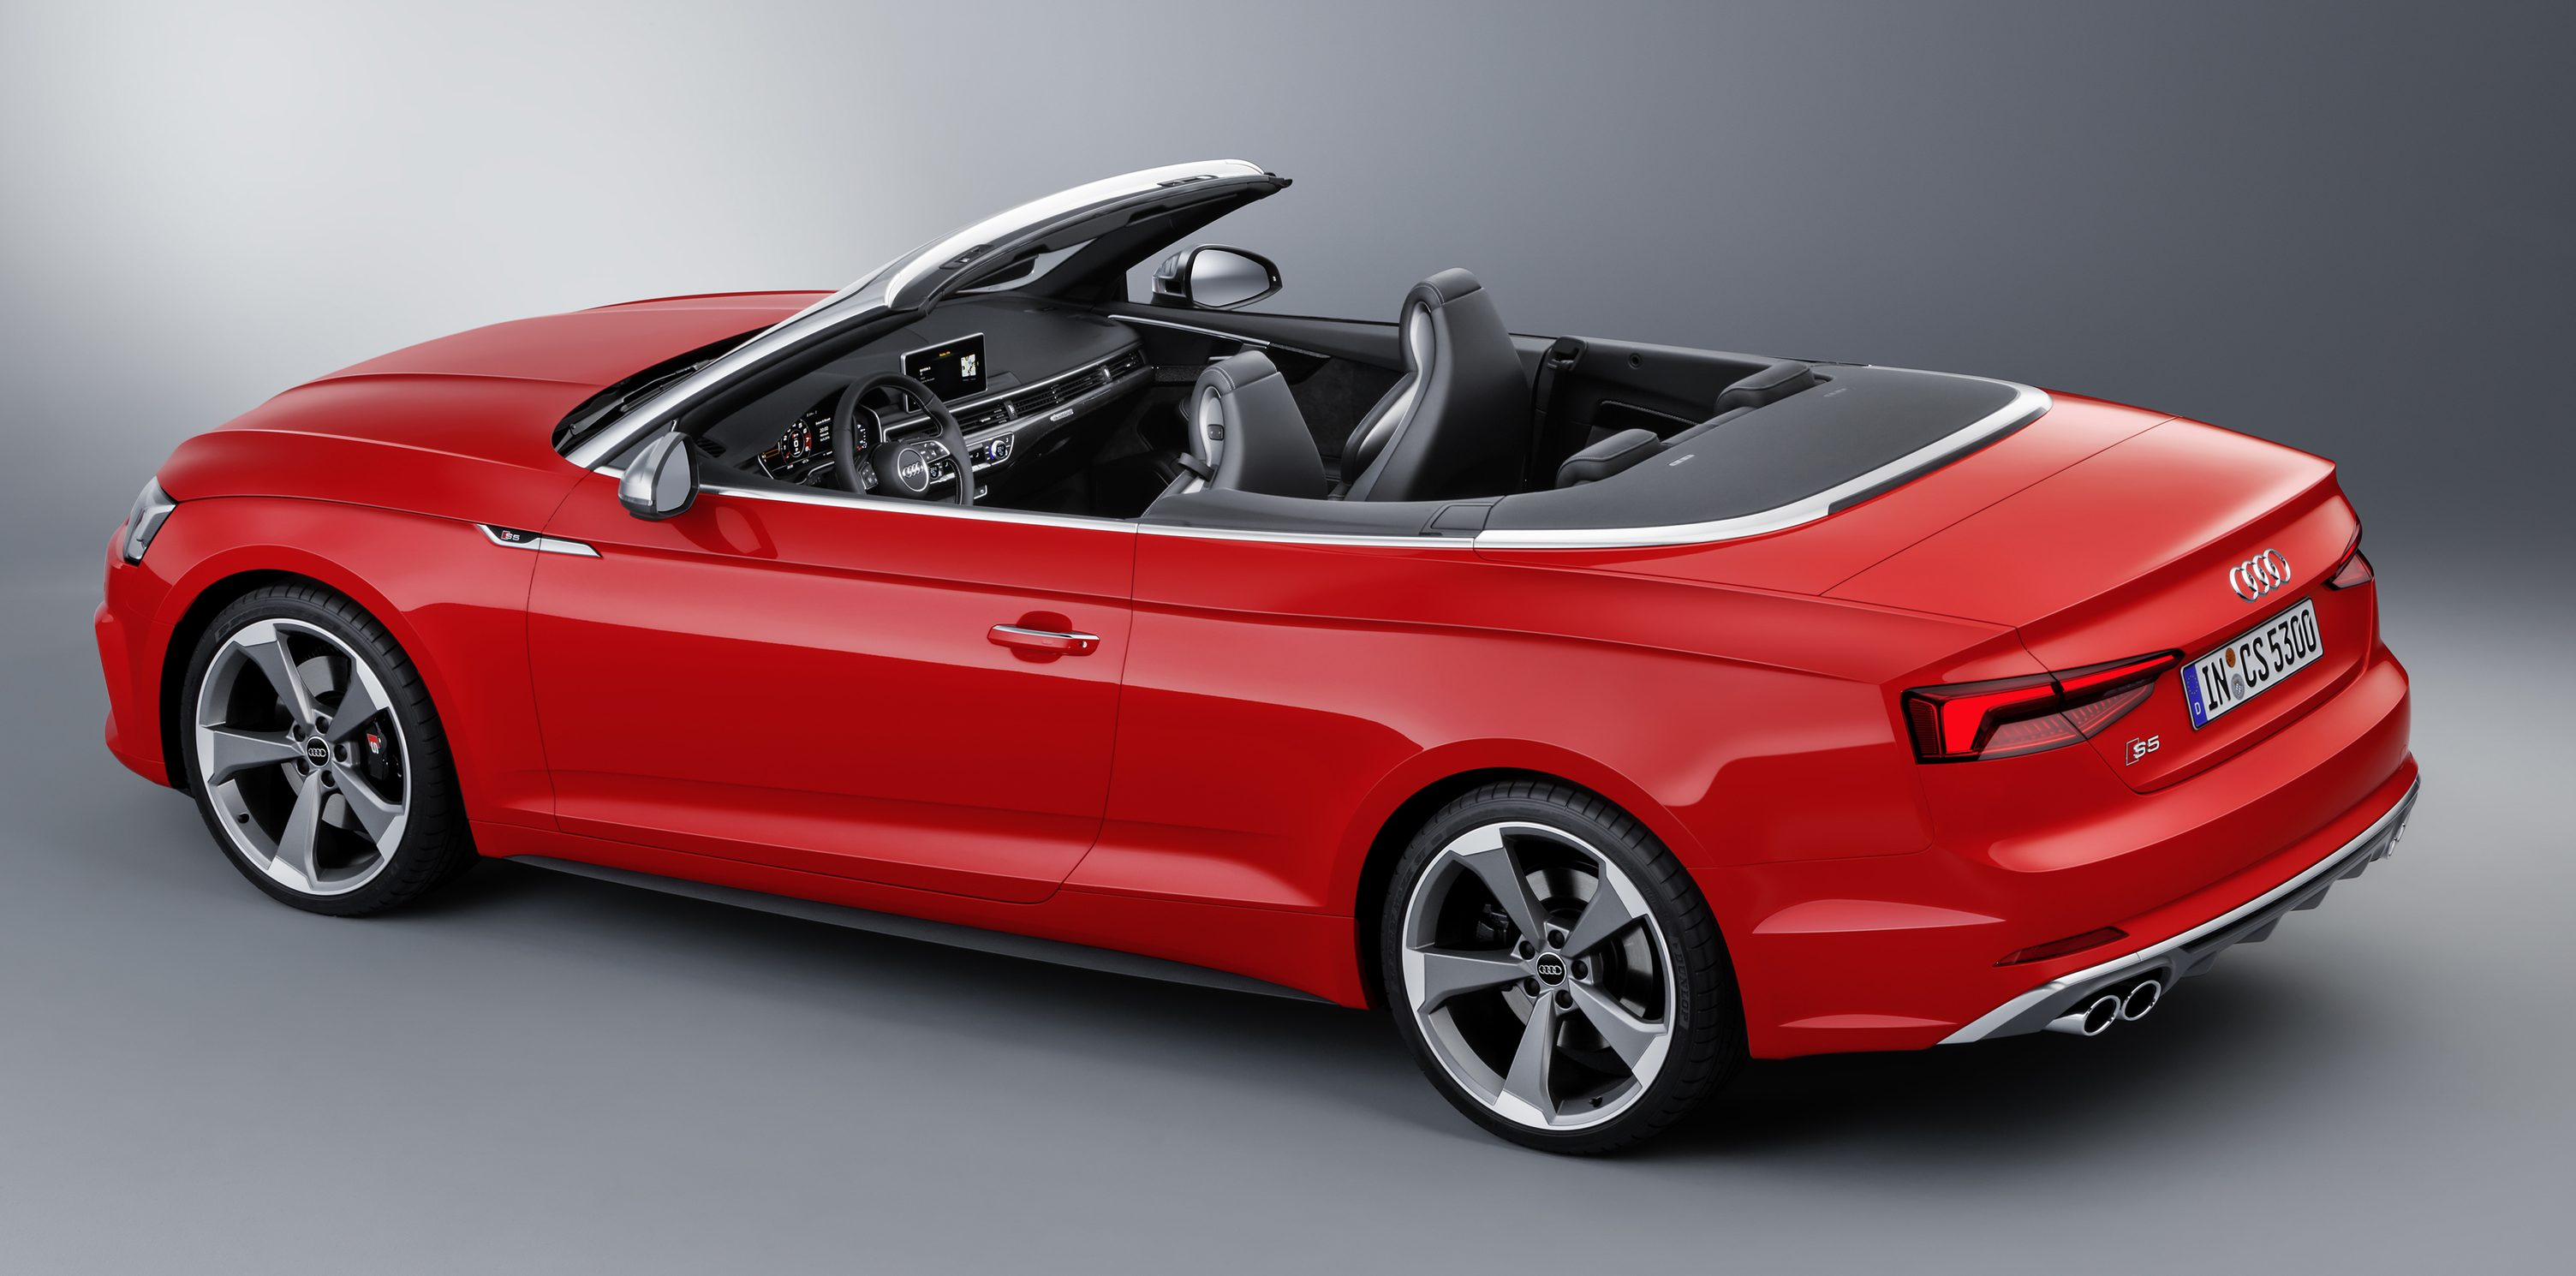 A5家族全新敞篷车,audi A5 Cabriolet 与 S5 Cabriolet。 Audi S5